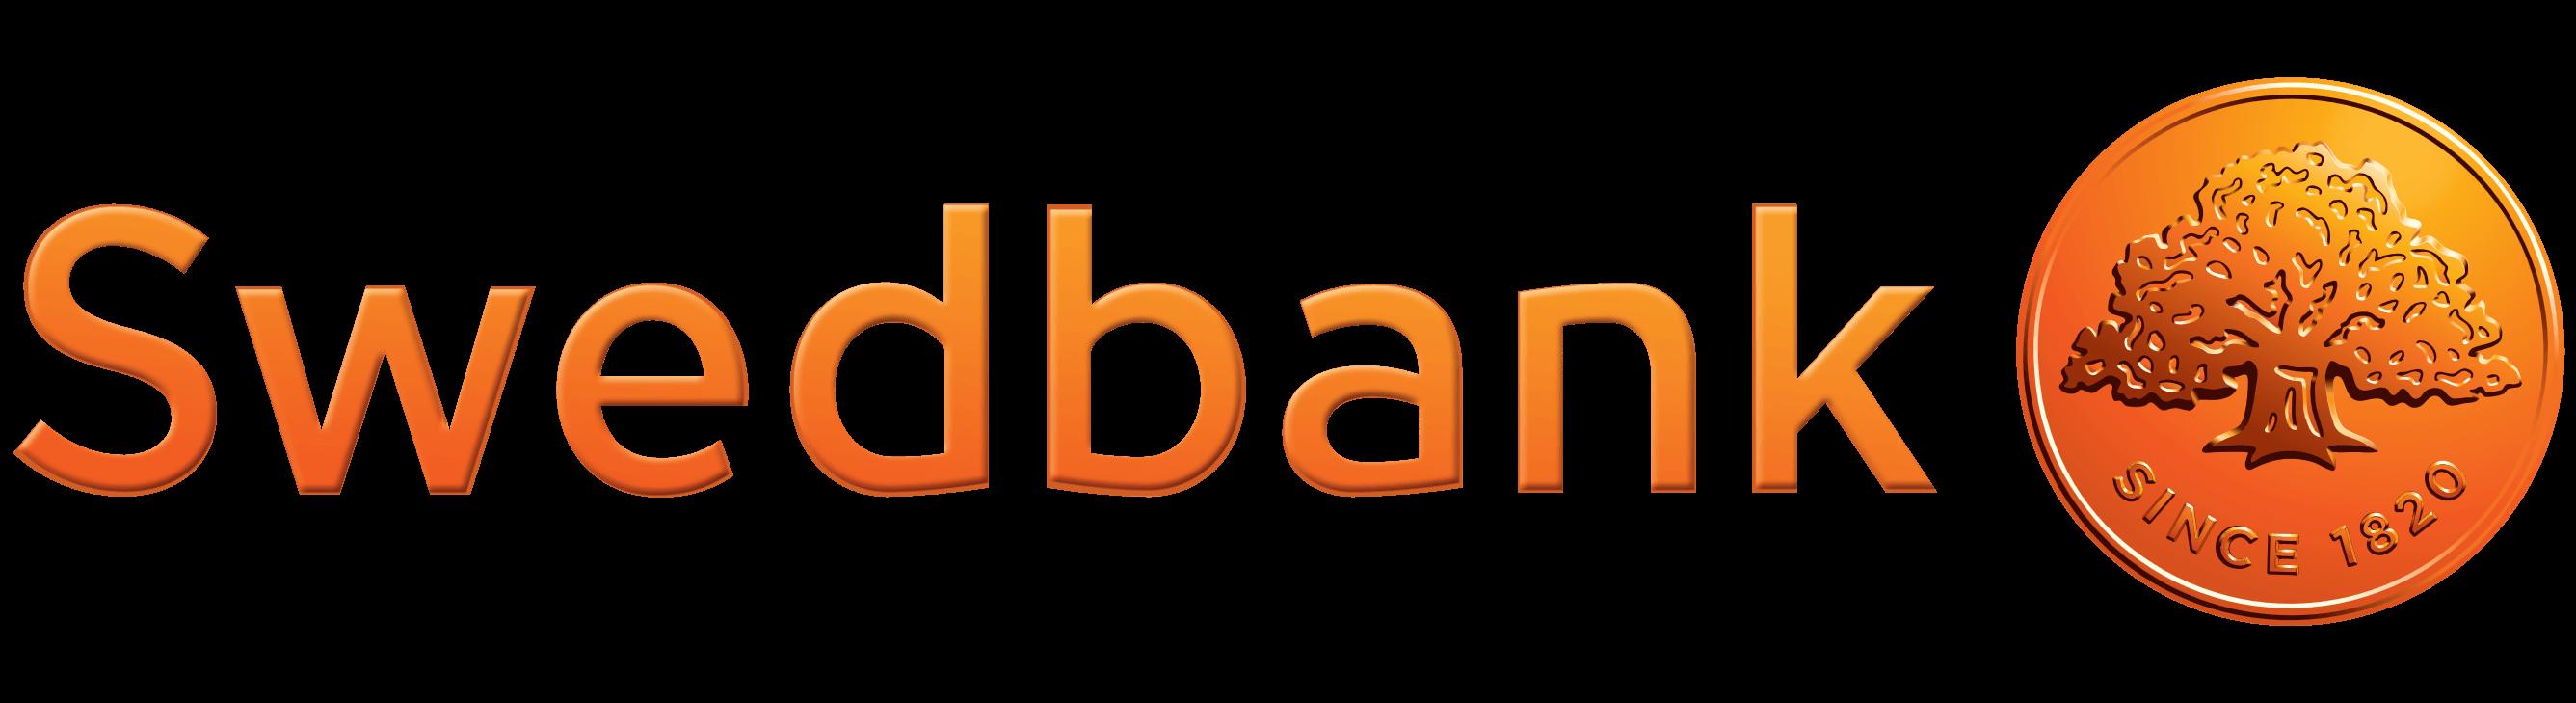 Swedbank_logo-png